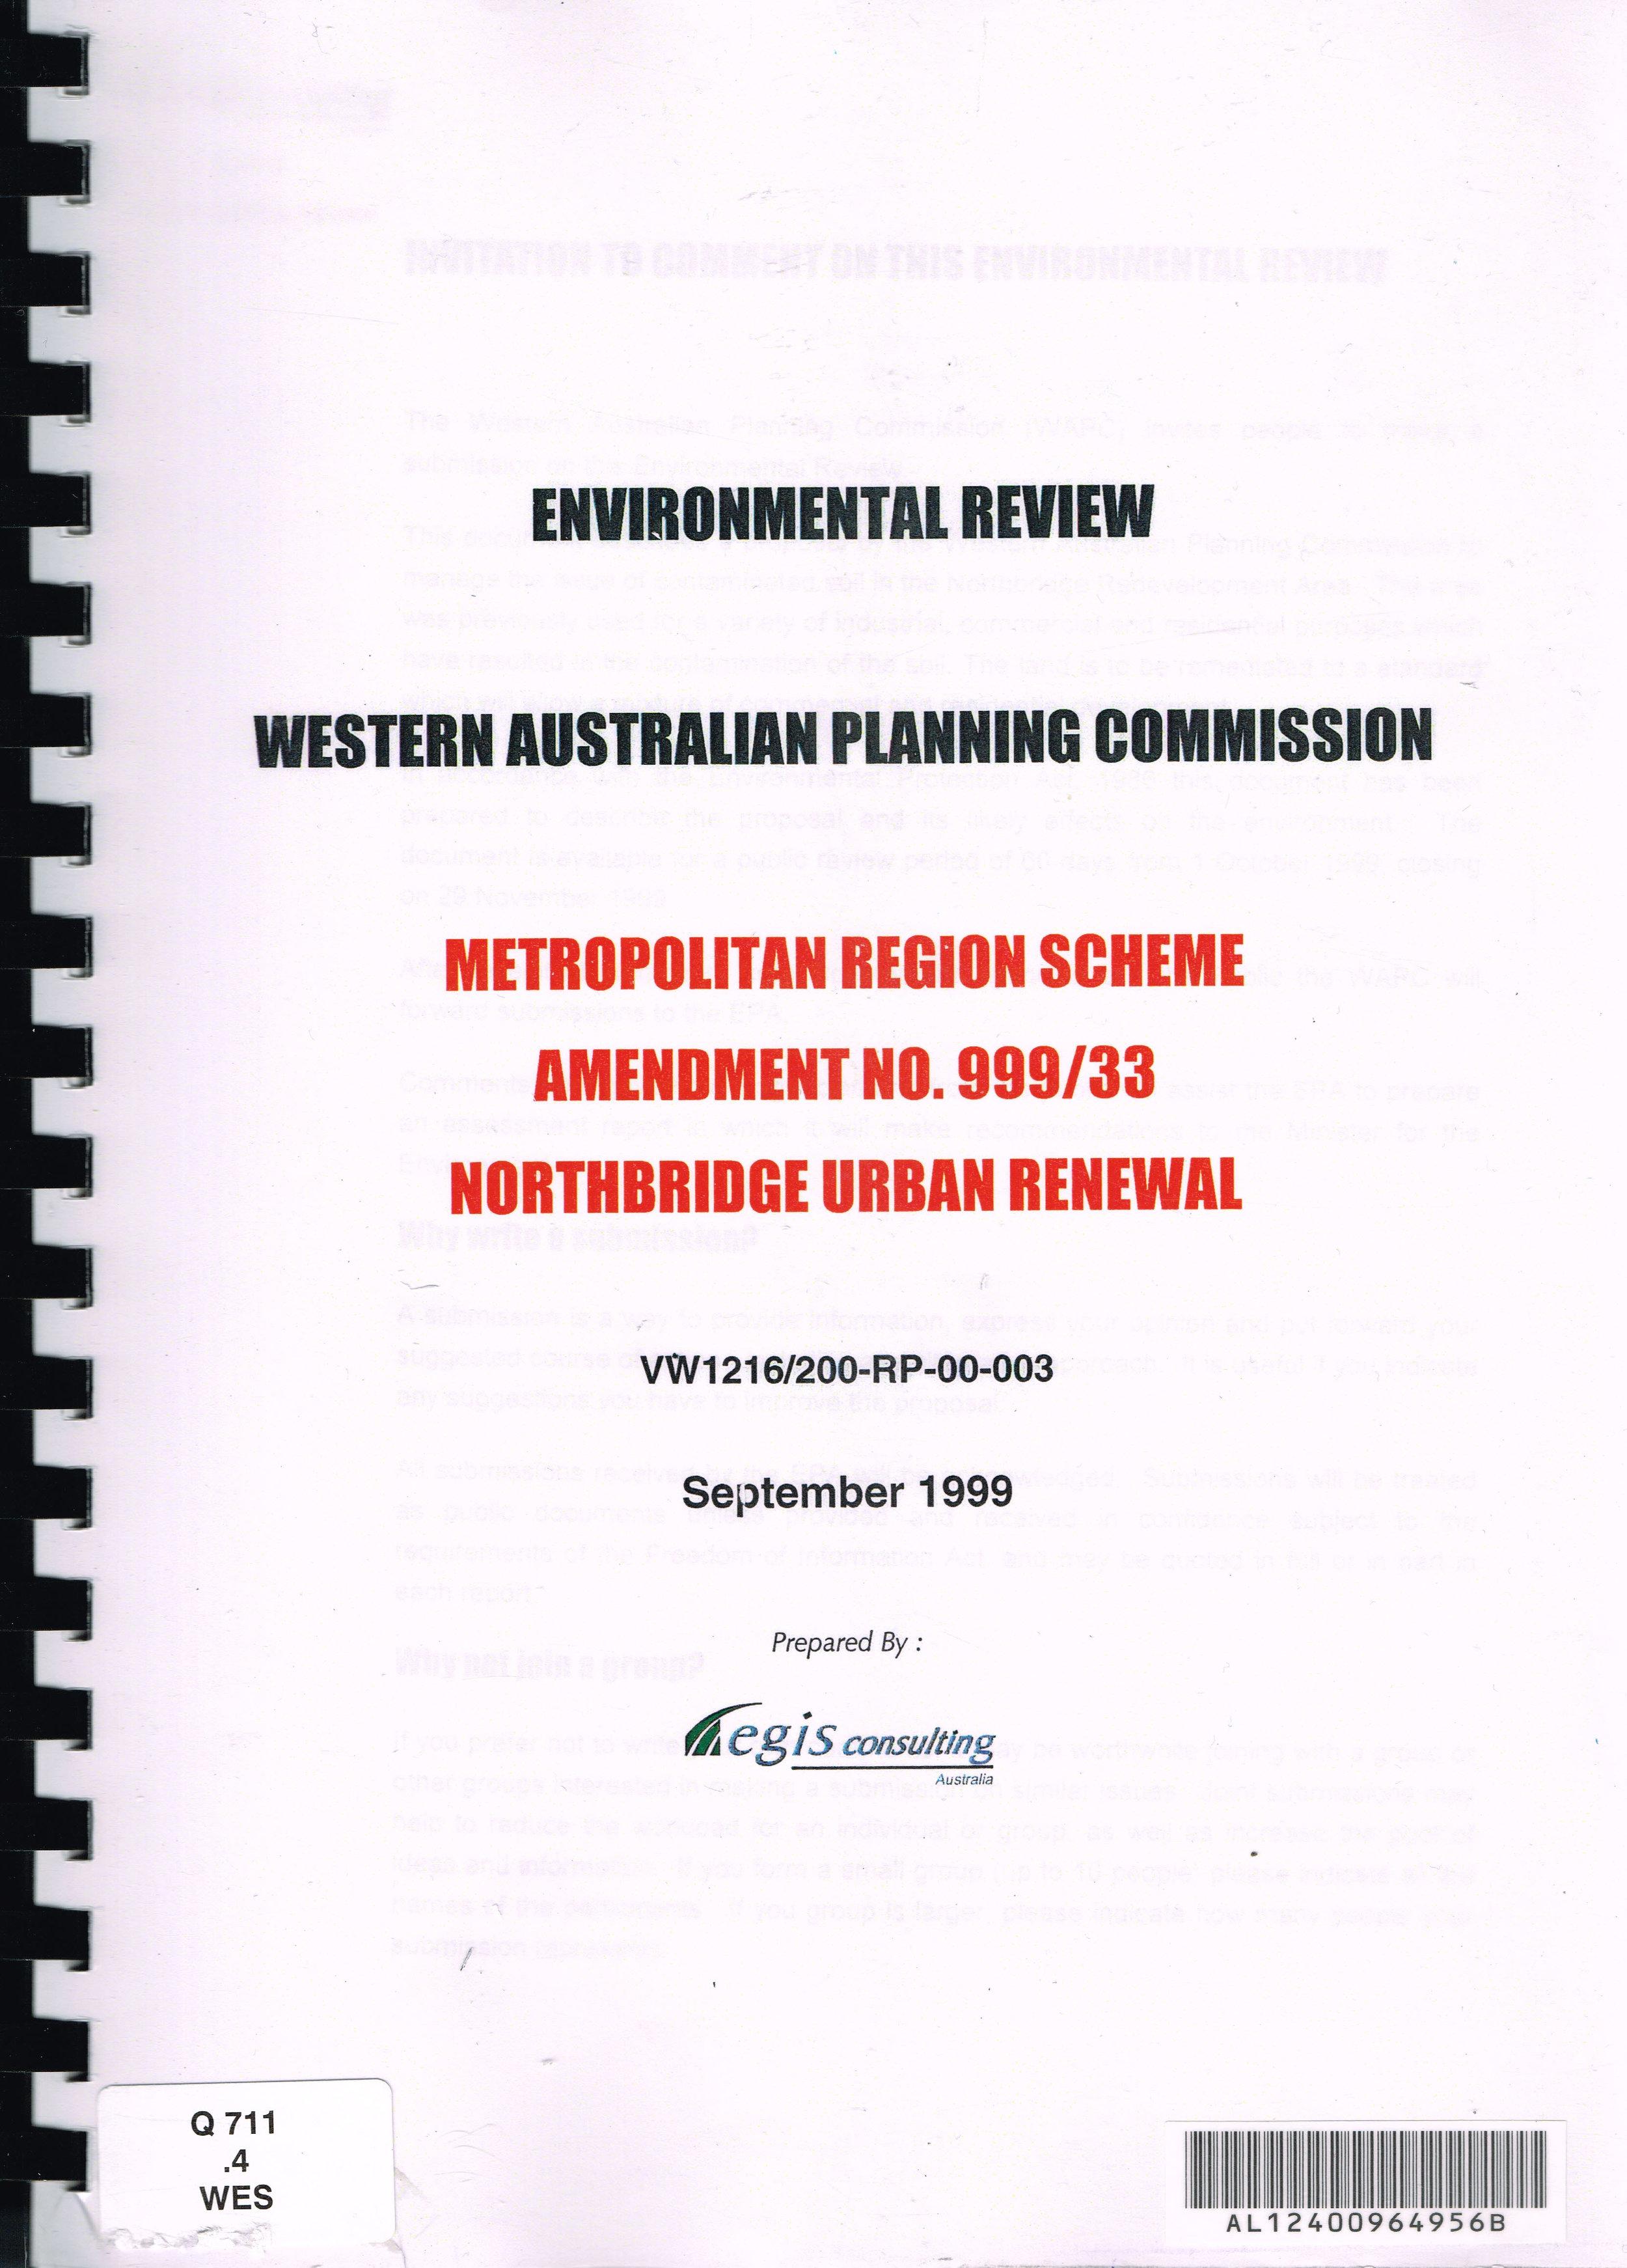 Environmental Review Western Australian Planning Commission : Metropolitan Region Scheme Amendment No. 999/33 Northbridge Urban Renewal September 1999  Egis Consulting